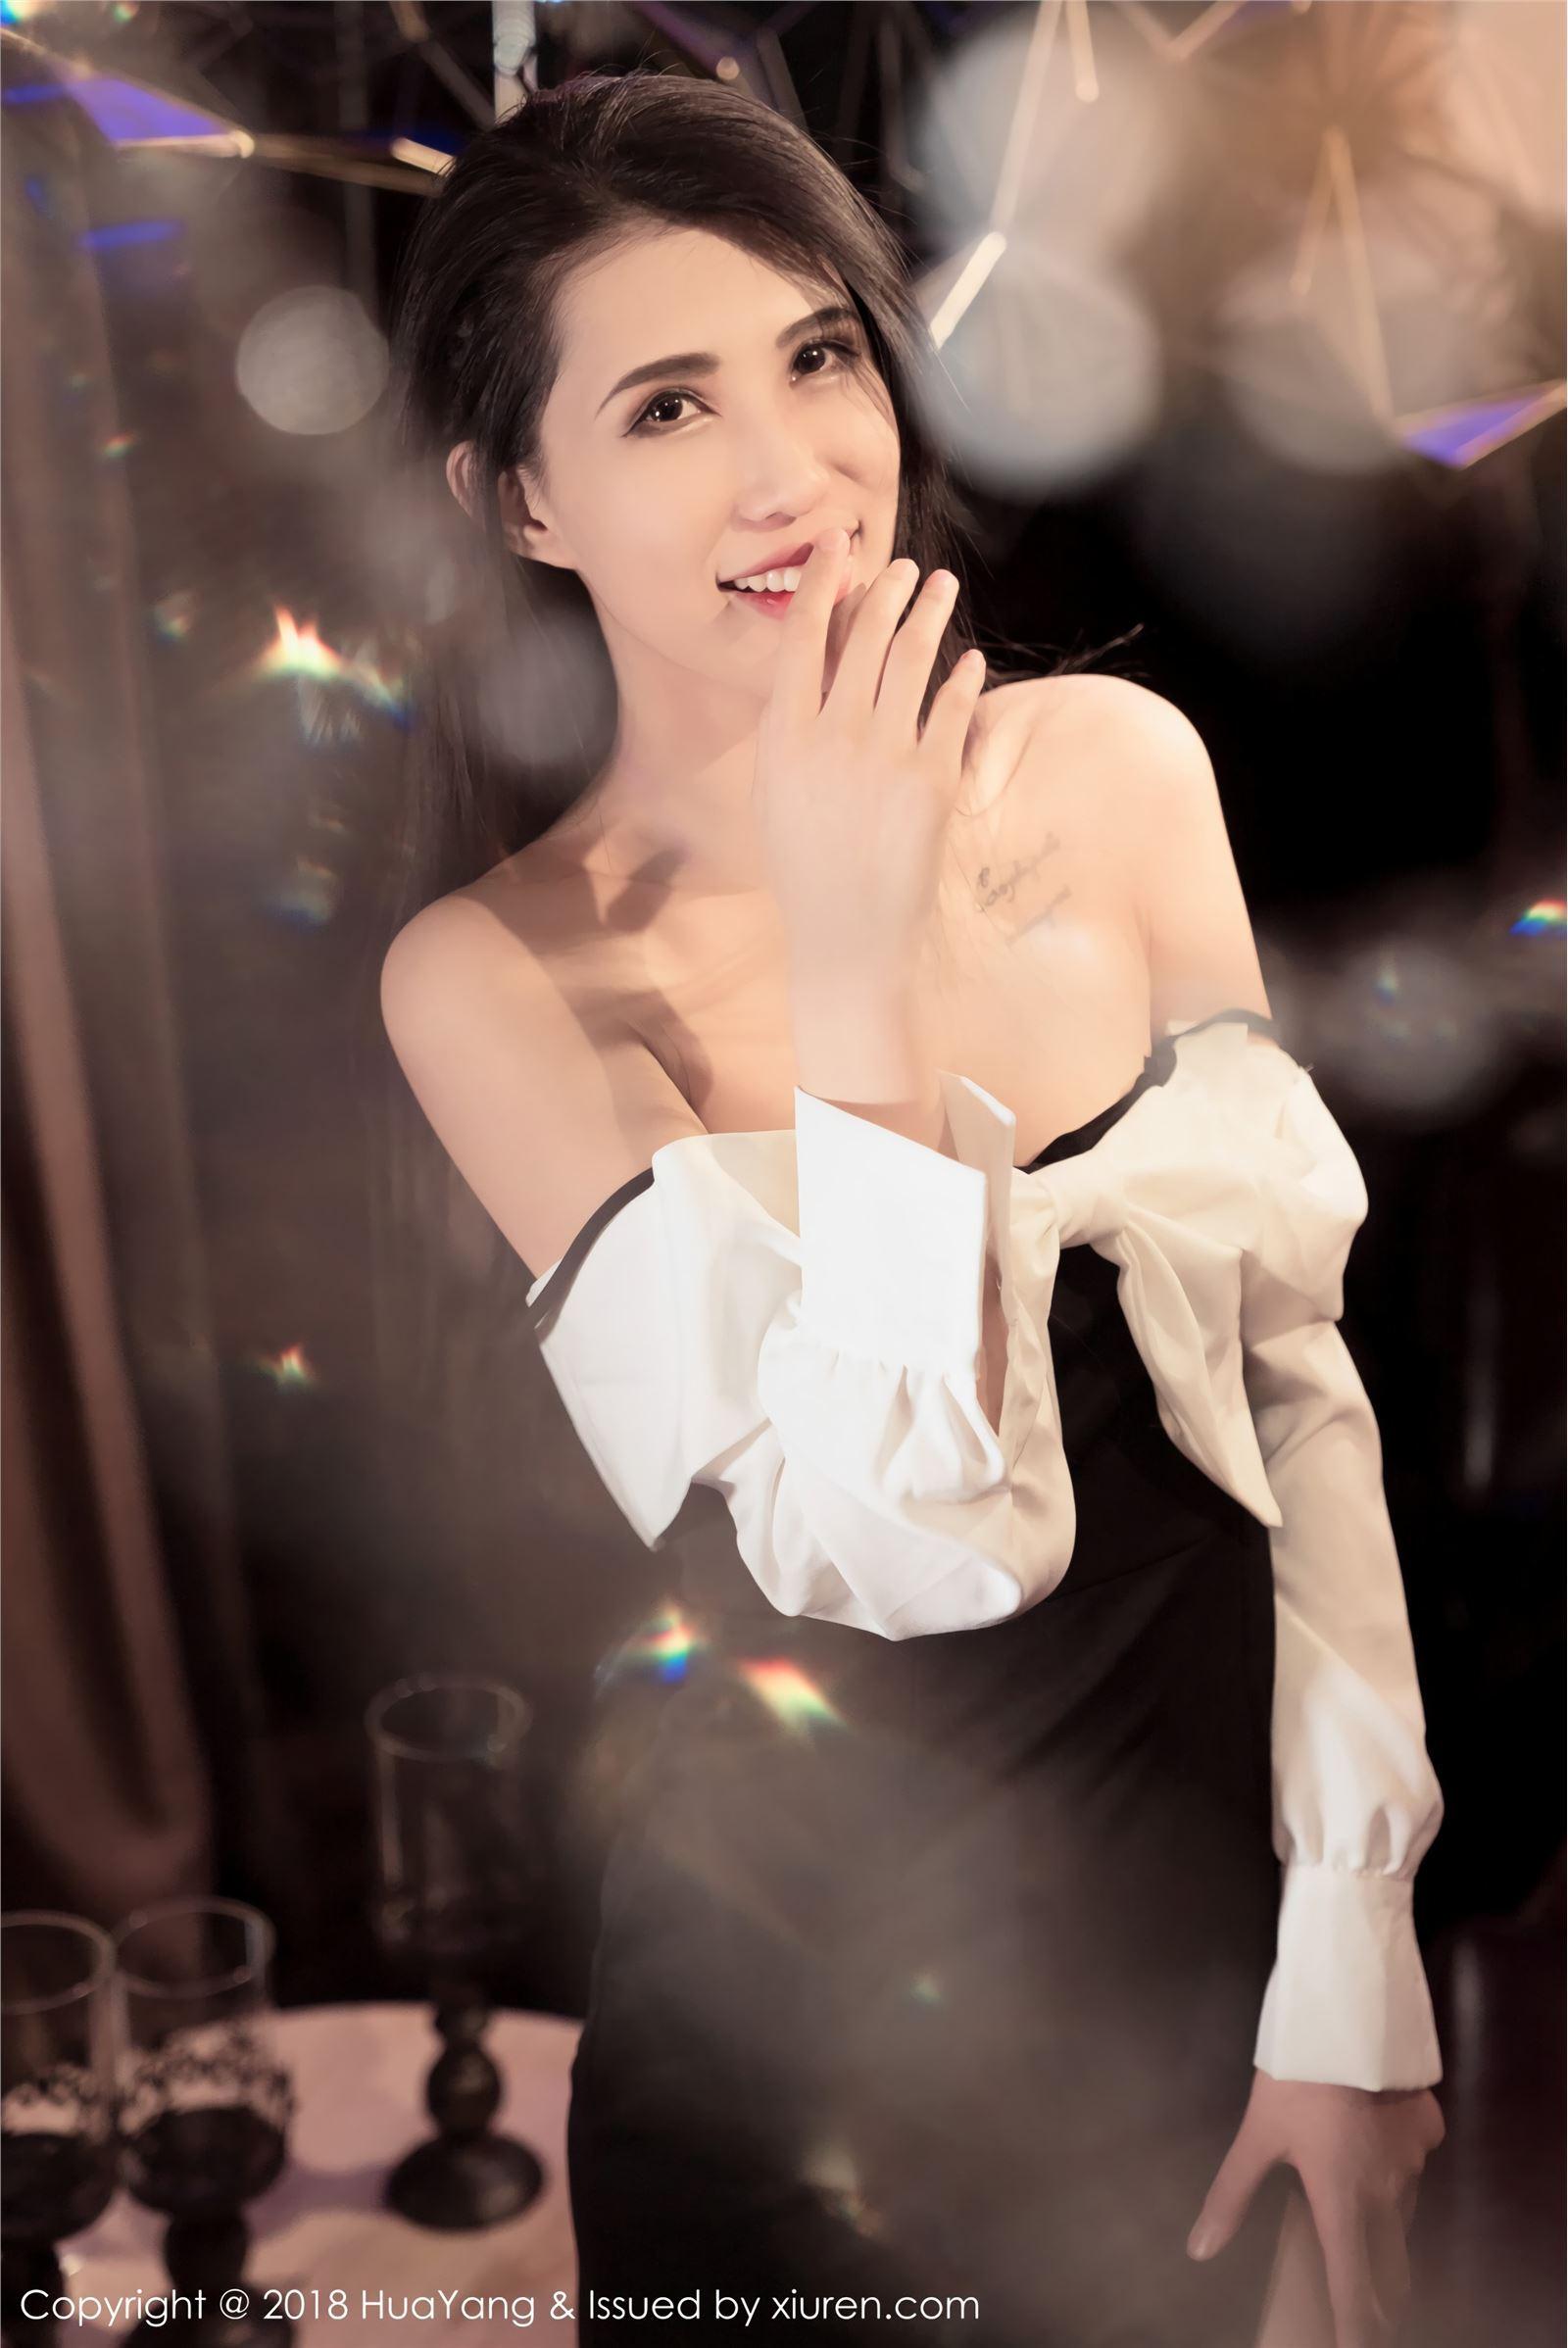 HuaYang 花漾show写真 2018.02.13 VOL.030 内衣私房 葛征Model